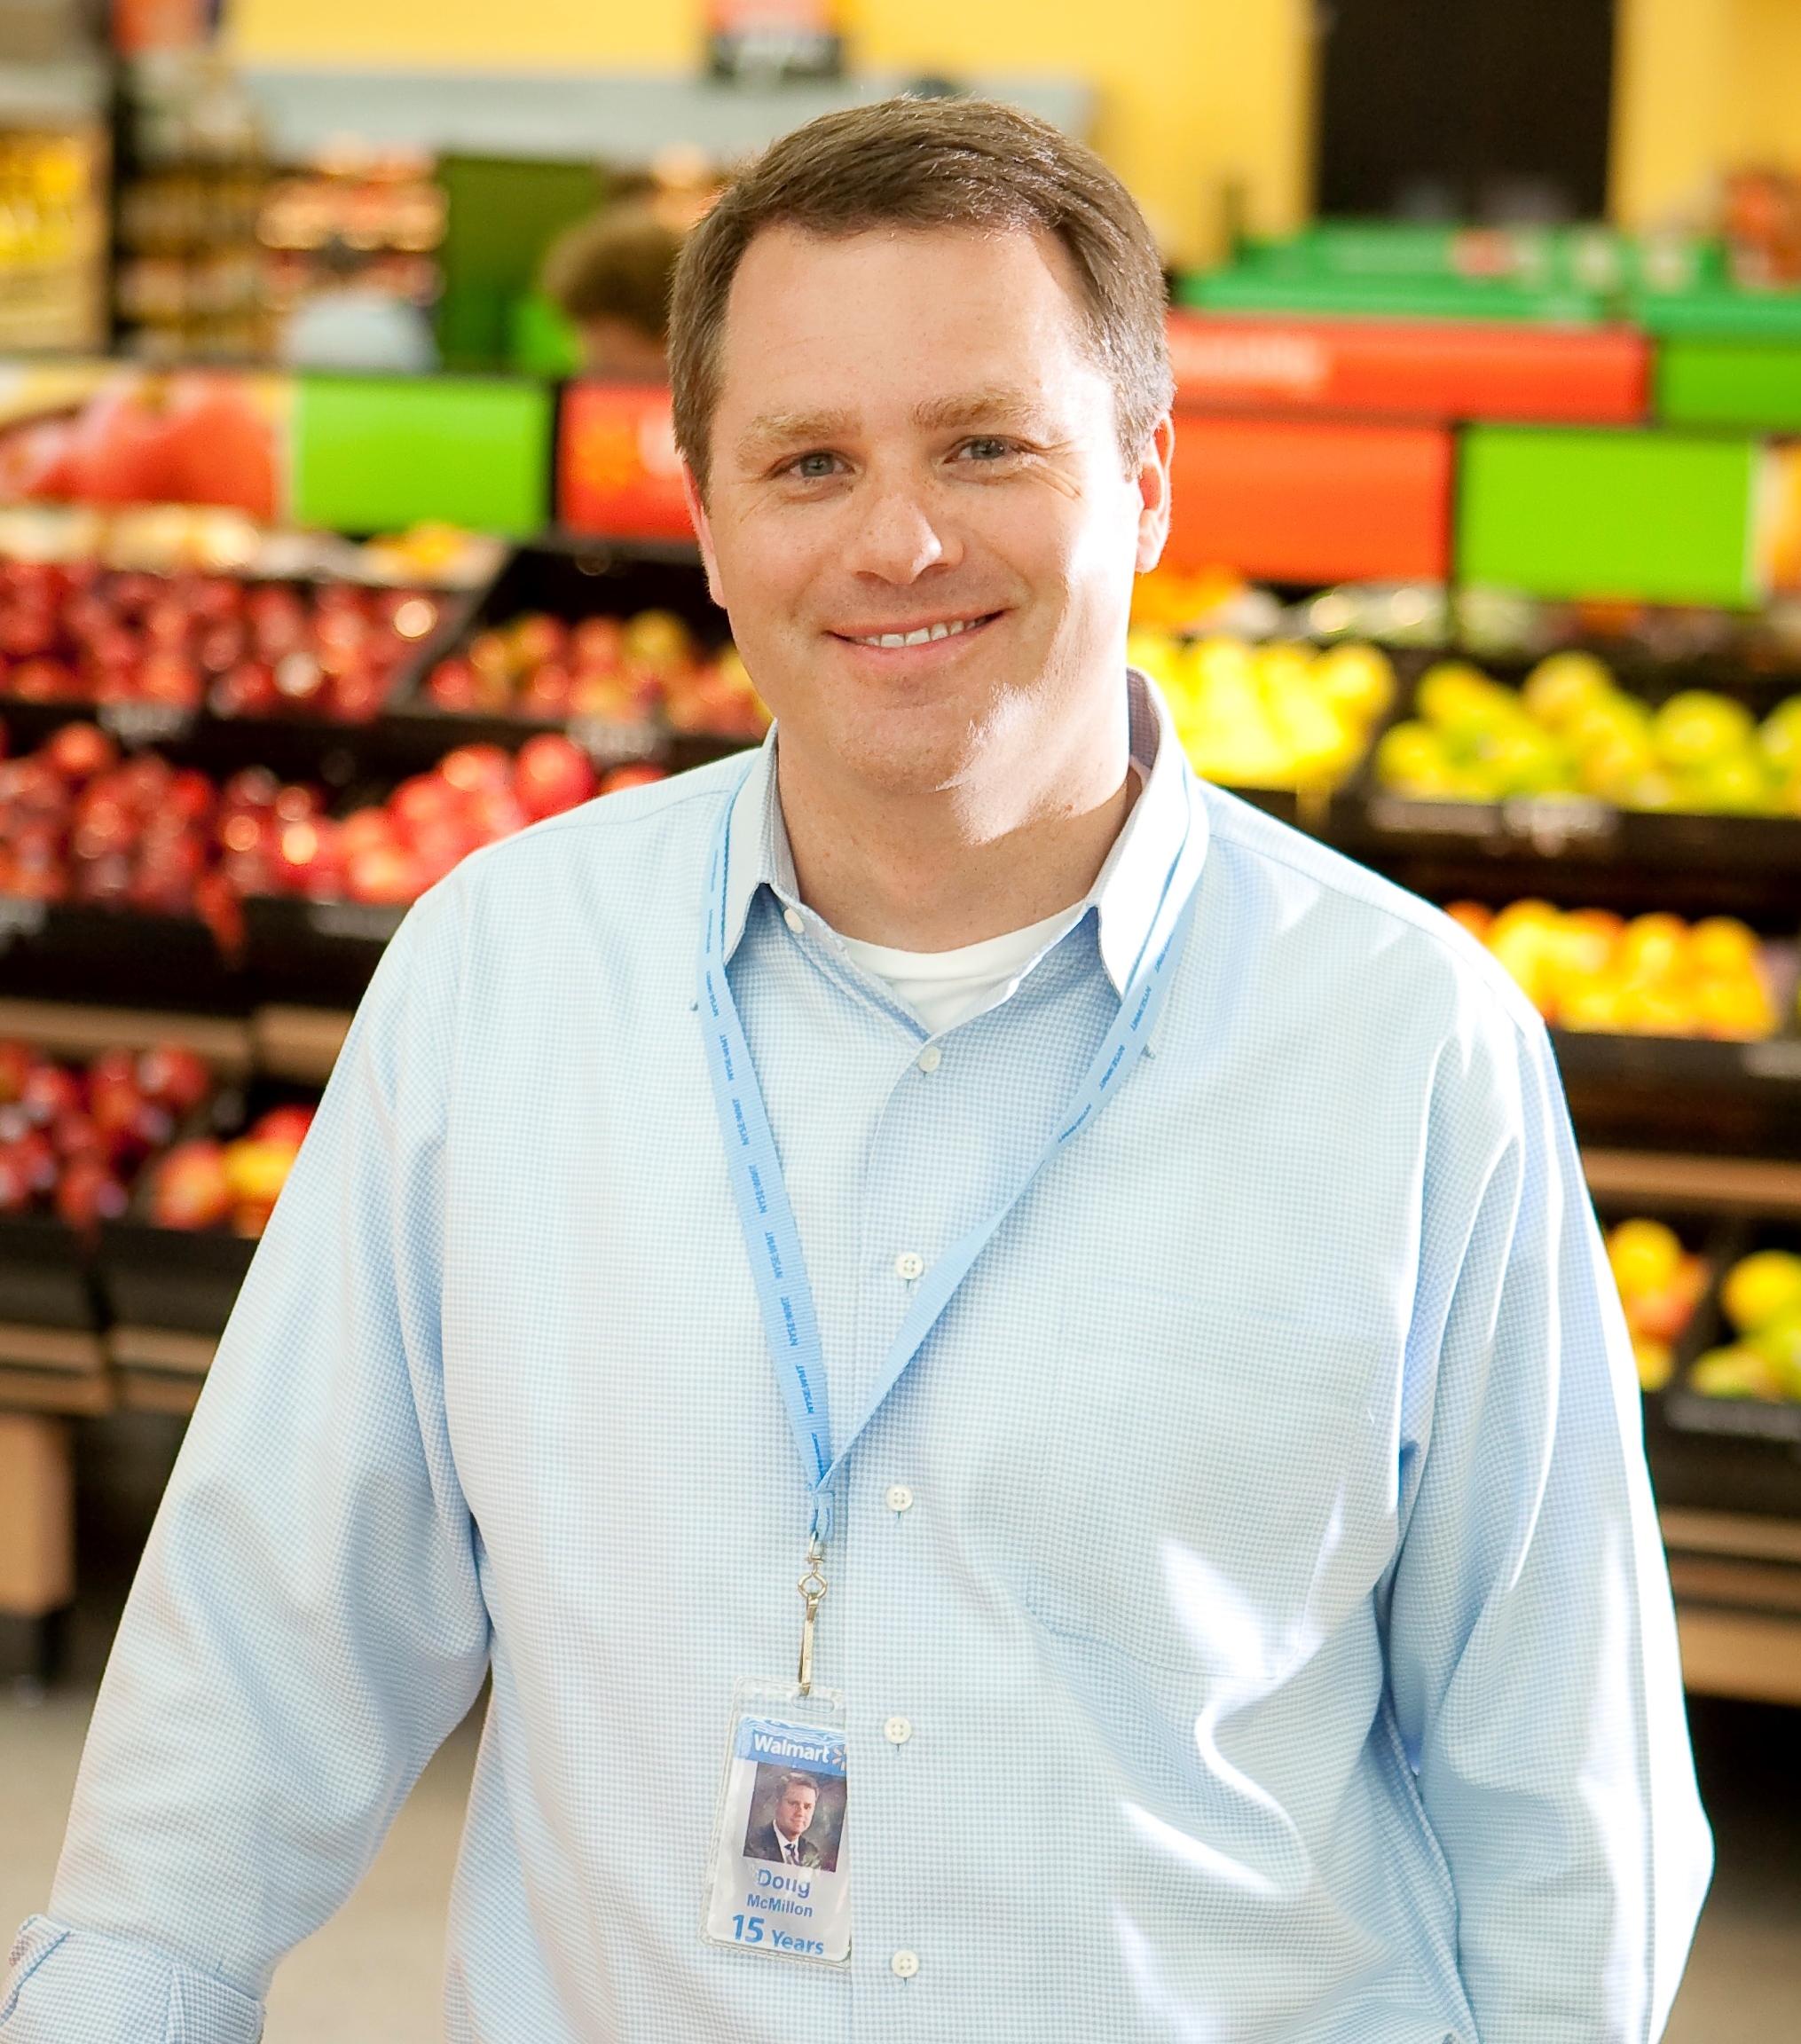 Walmart Going Pay Bonus To Their Hourly Employees In The Outbreak Of Coronavirus